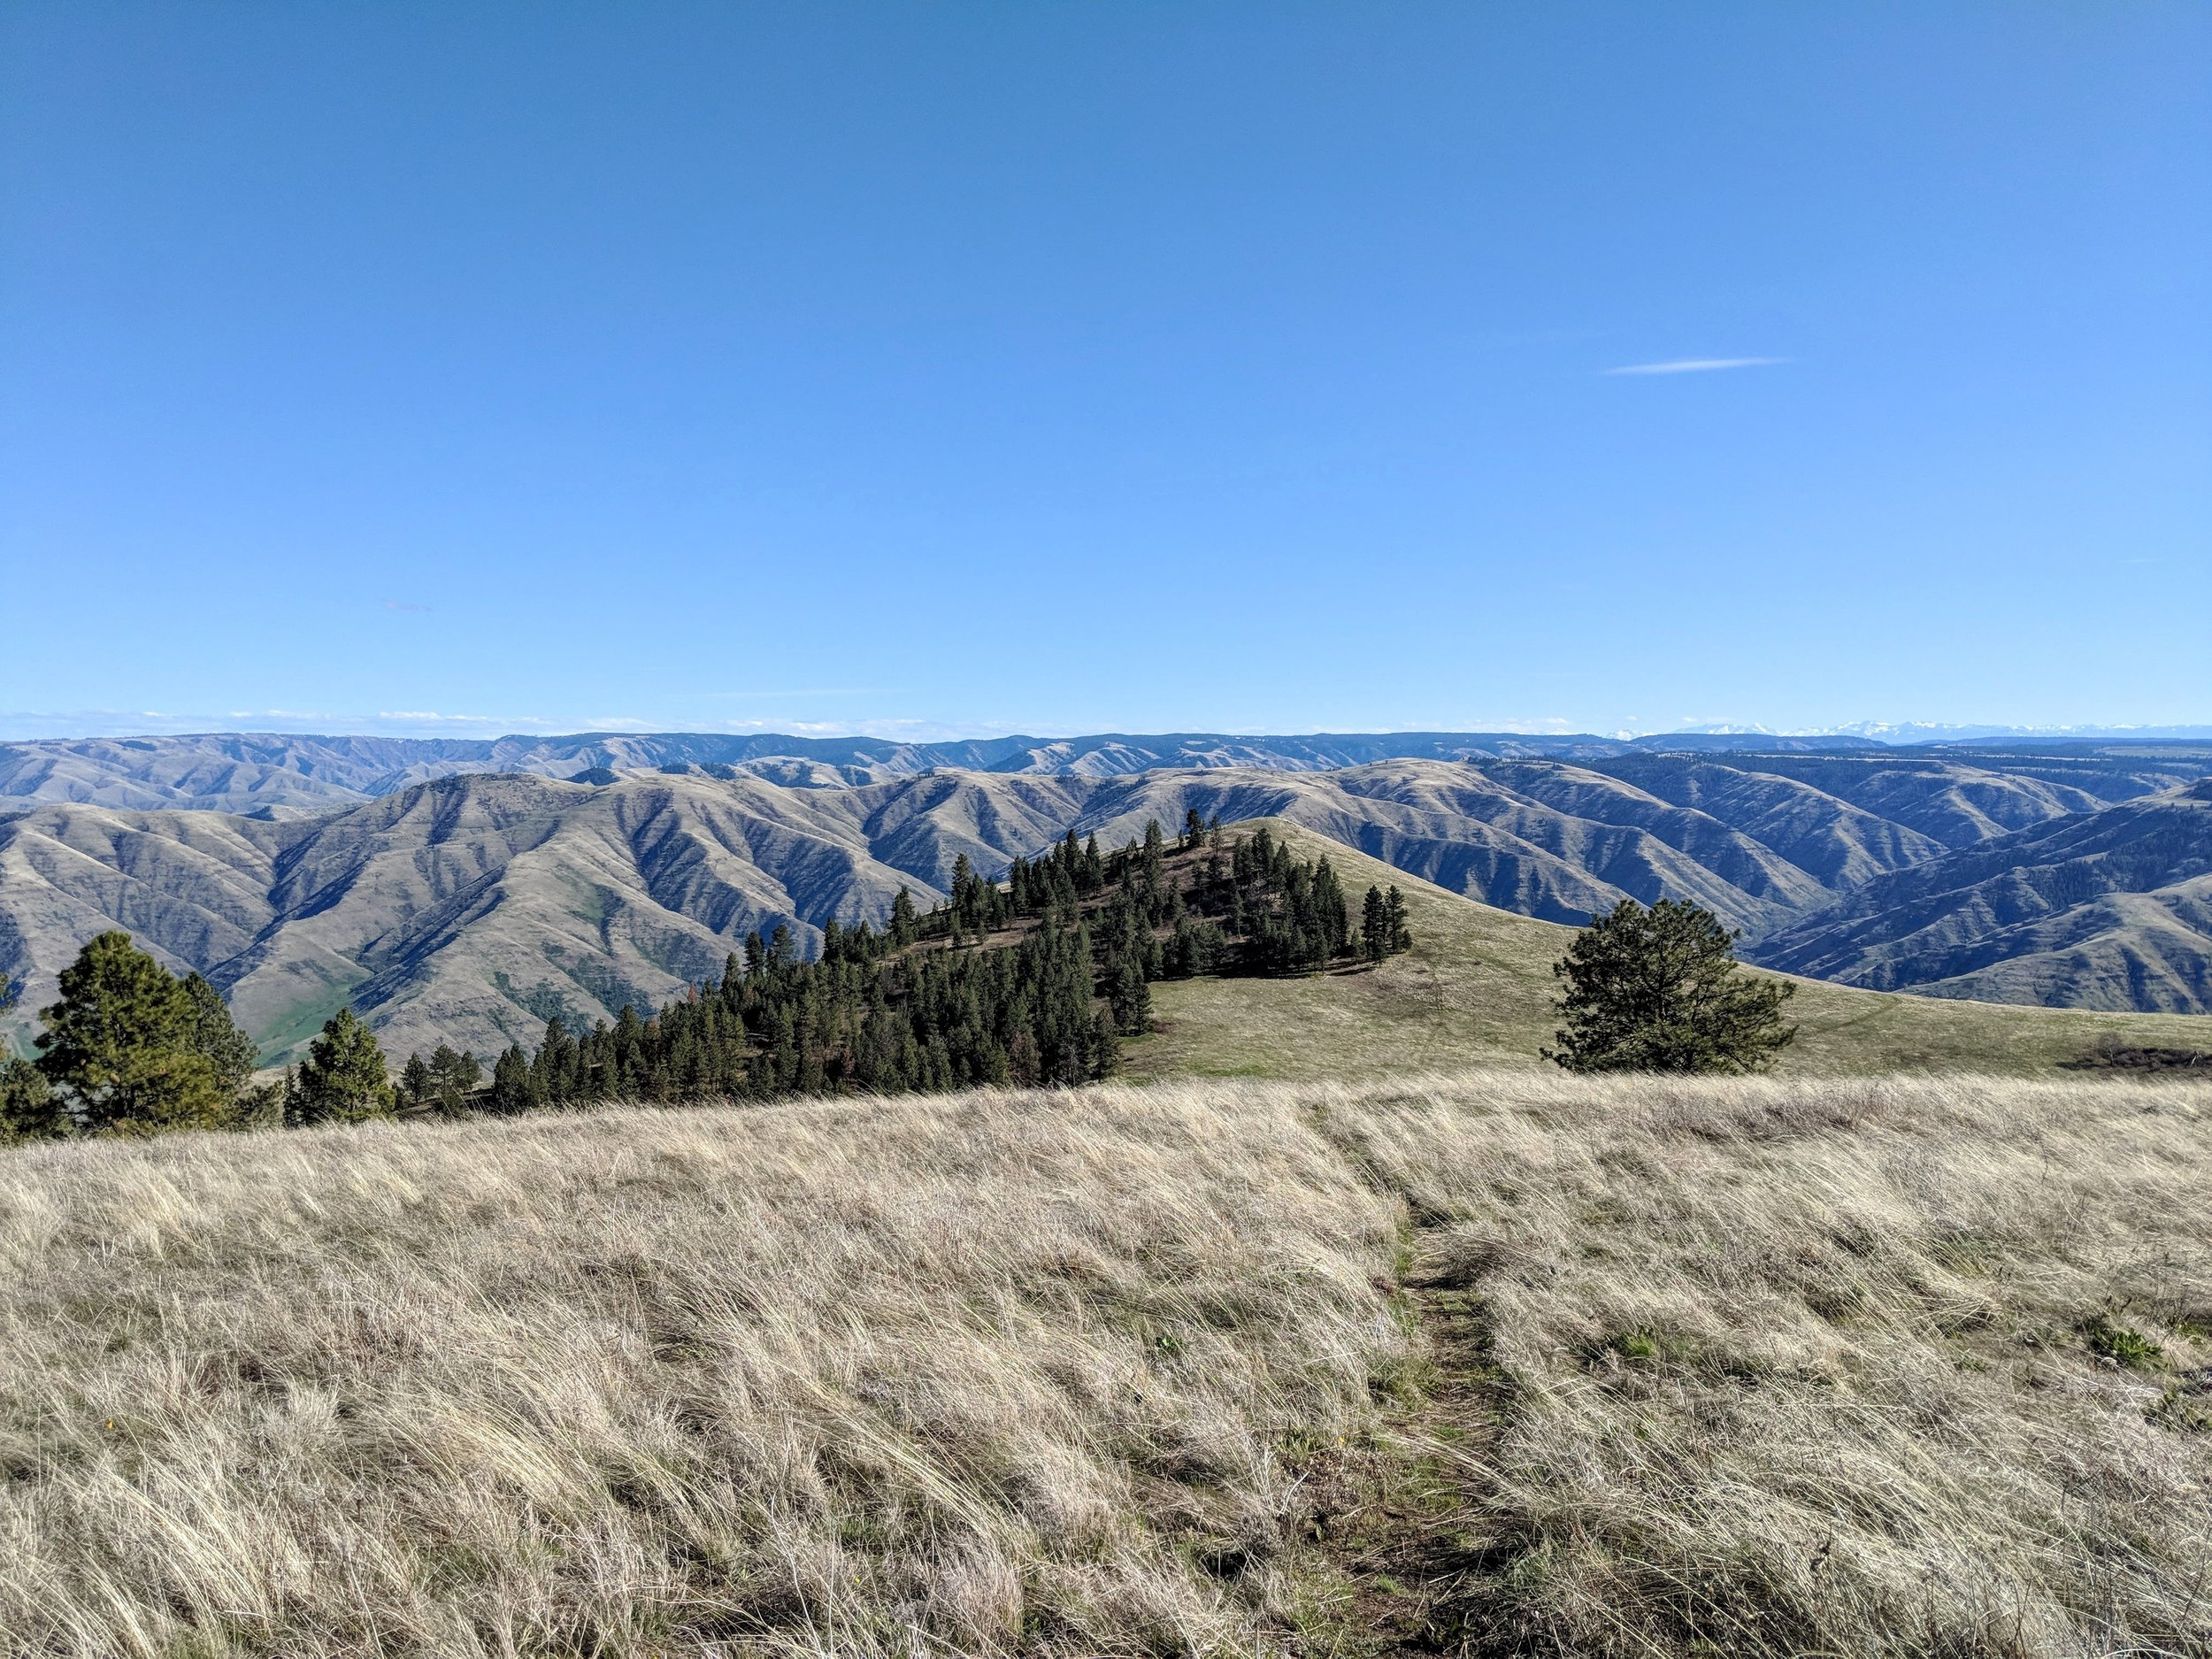 More wonderful views